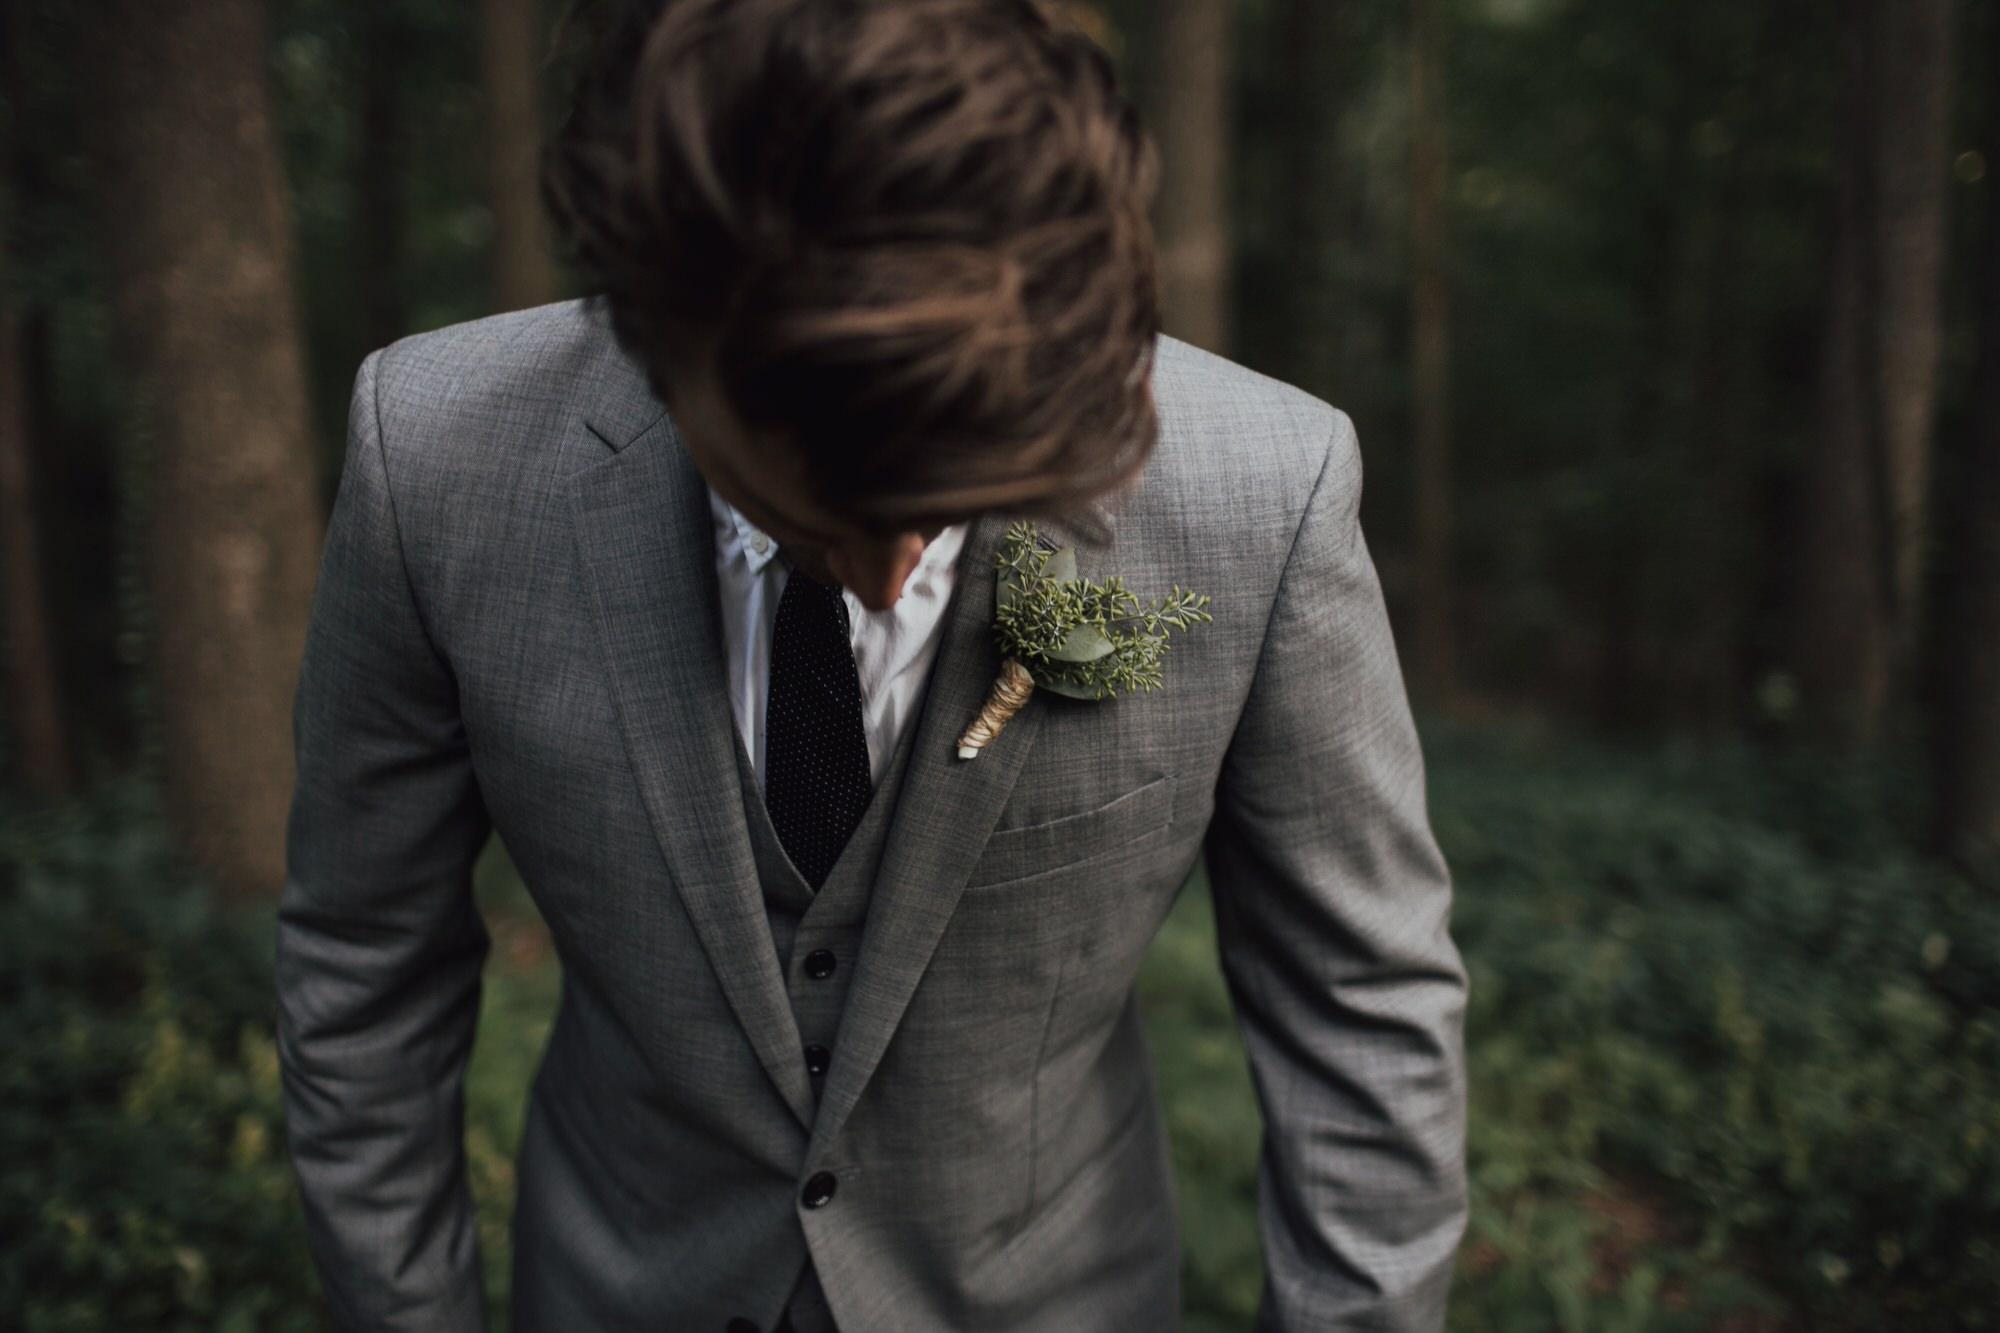 emily-aaron-rochester-new-york-wedding-photographer-107.JPG